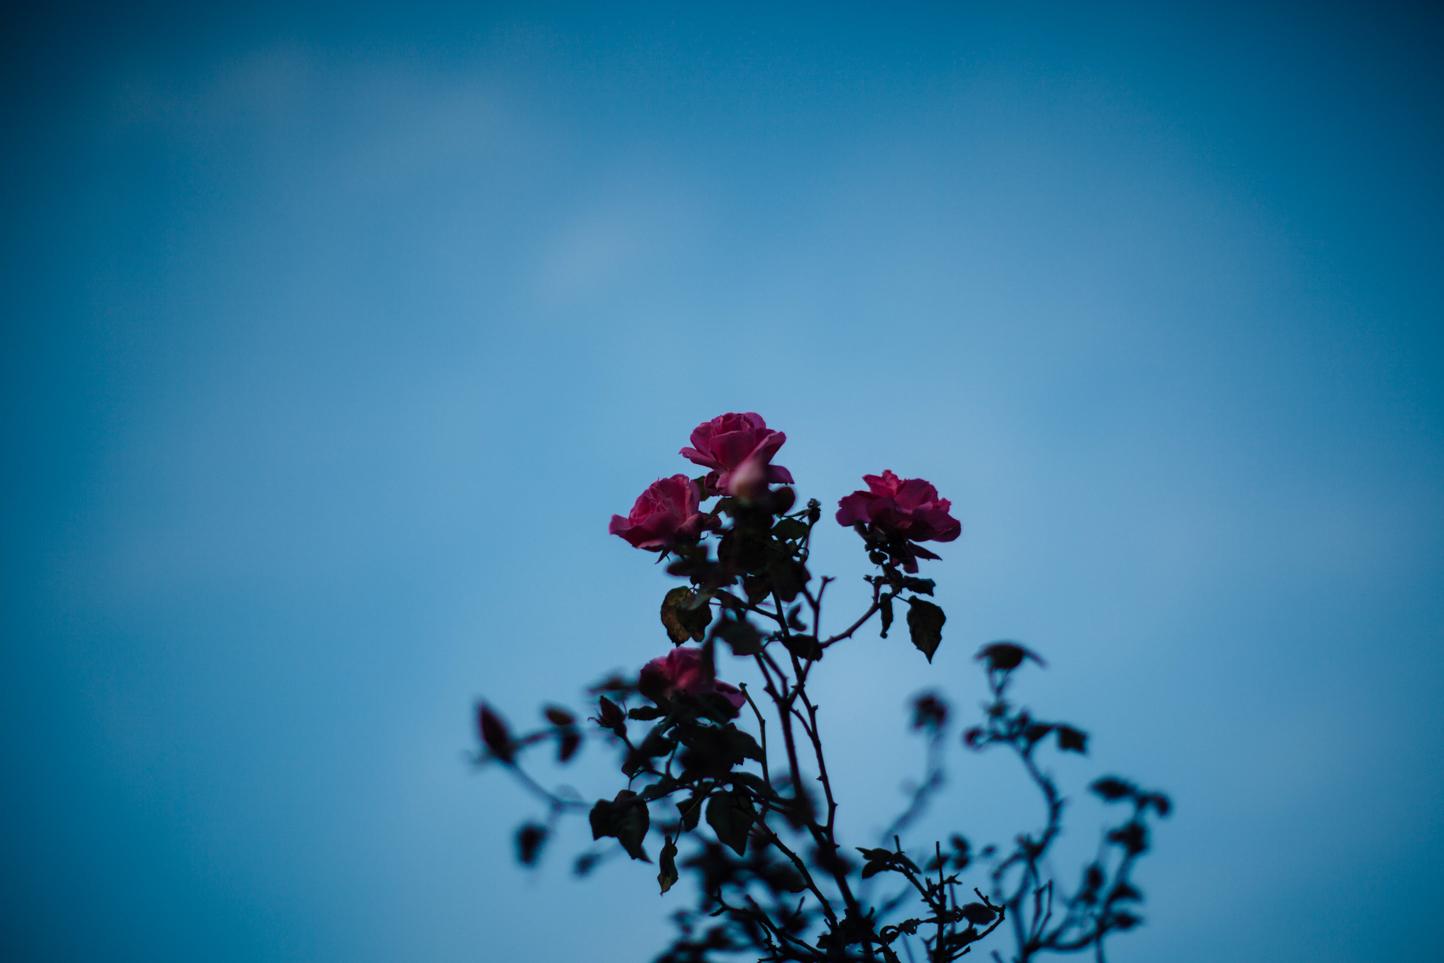 Rose Garden in winter.